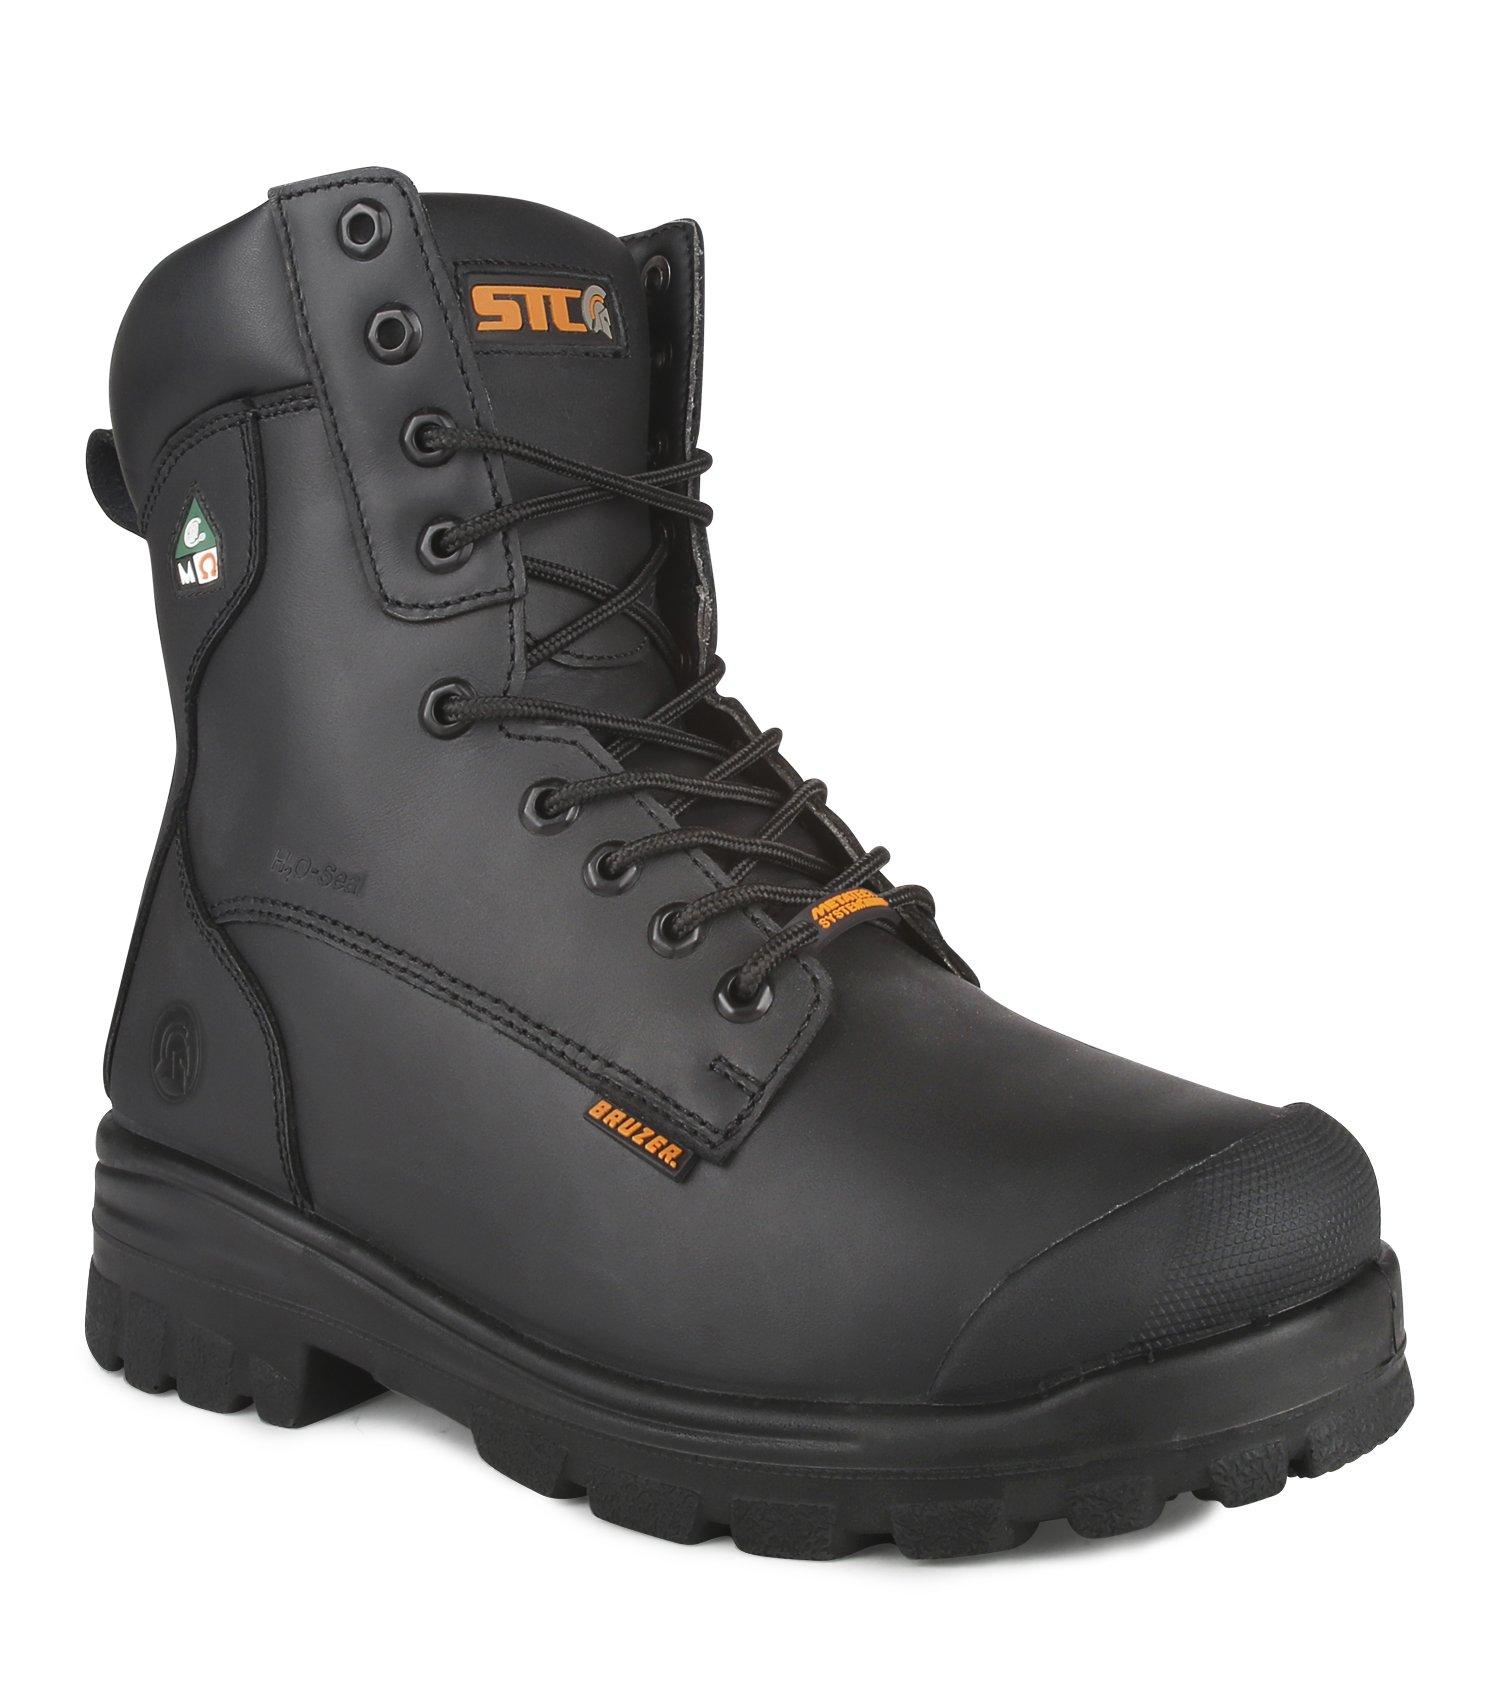 STC S29035 Master Met Work Boots, Black